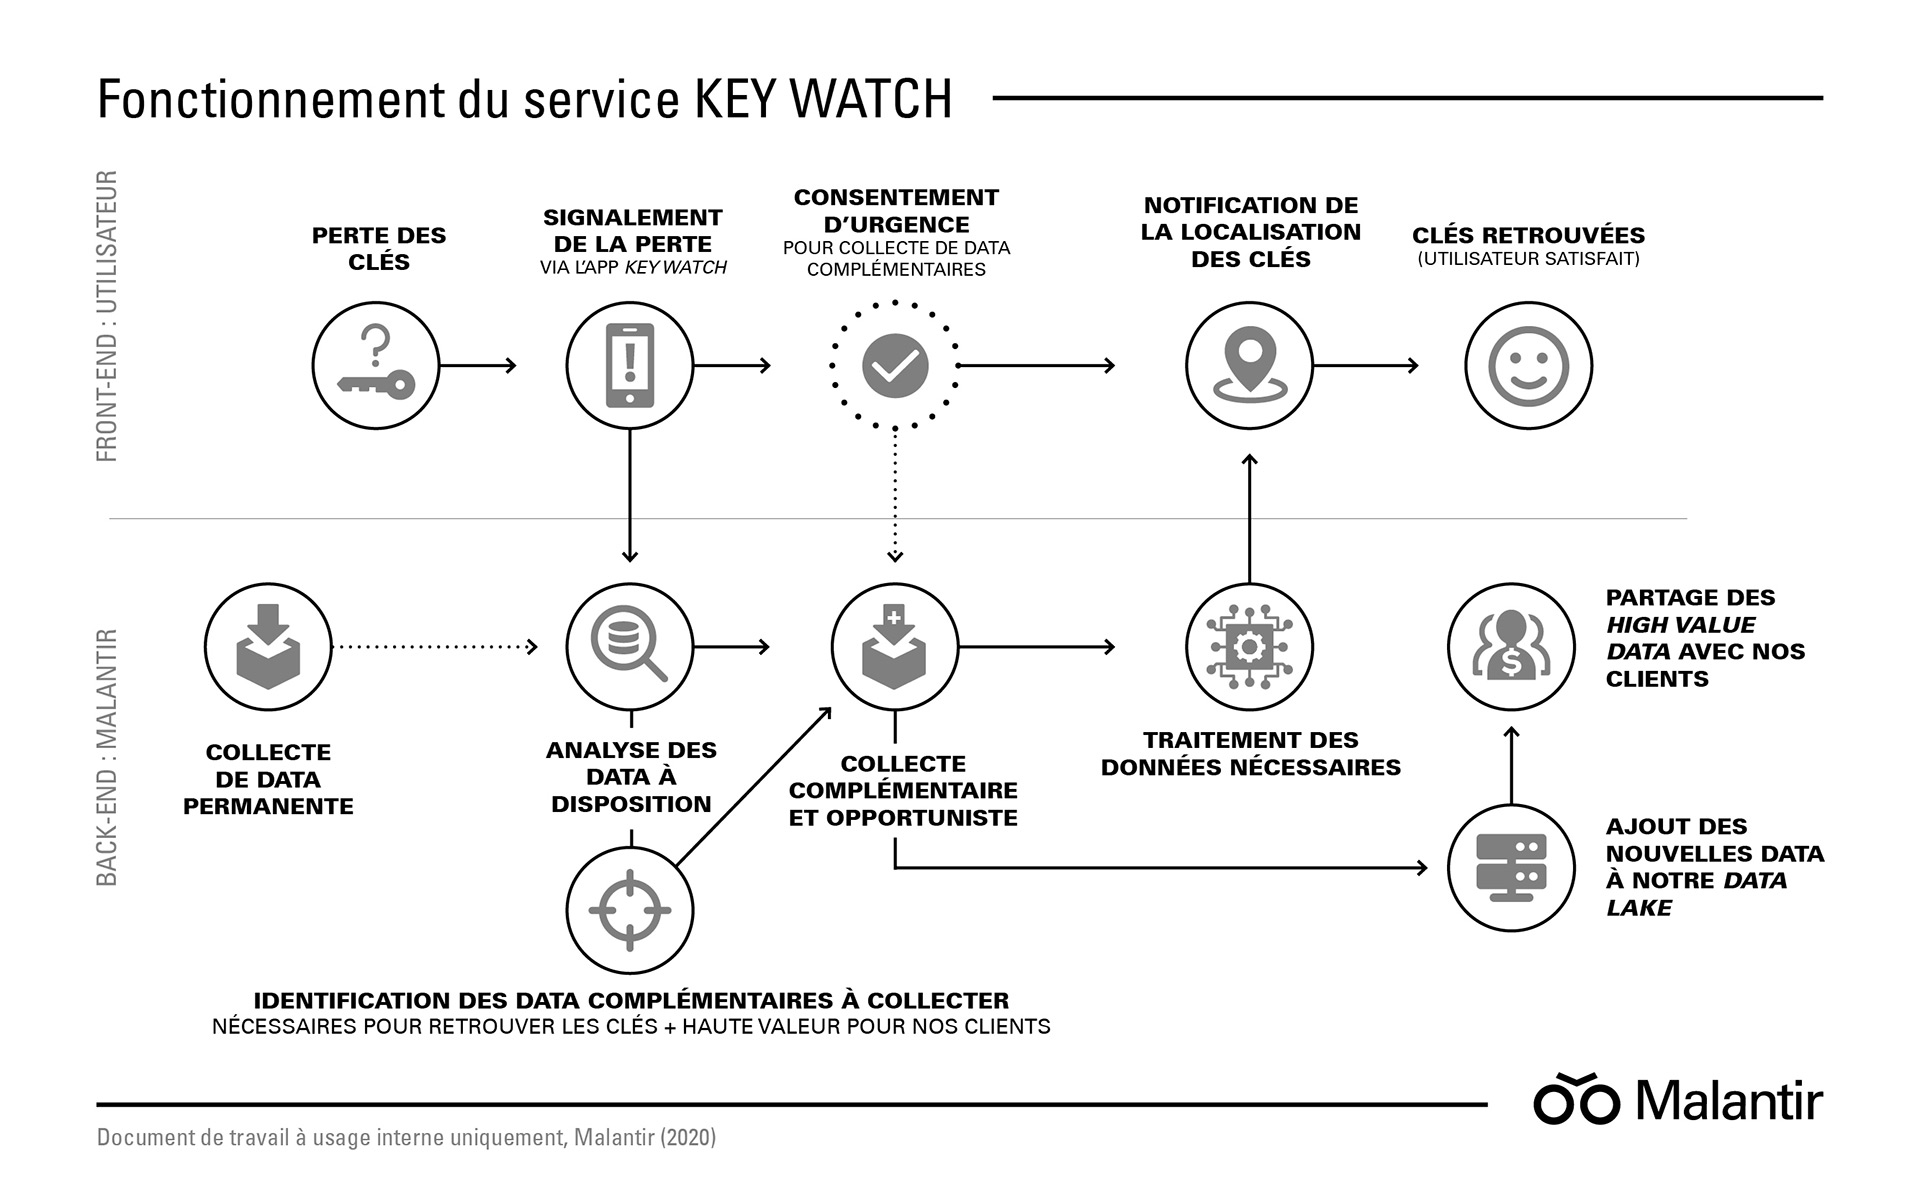 Malantir : Slide Fonctionnement du service Key Watch